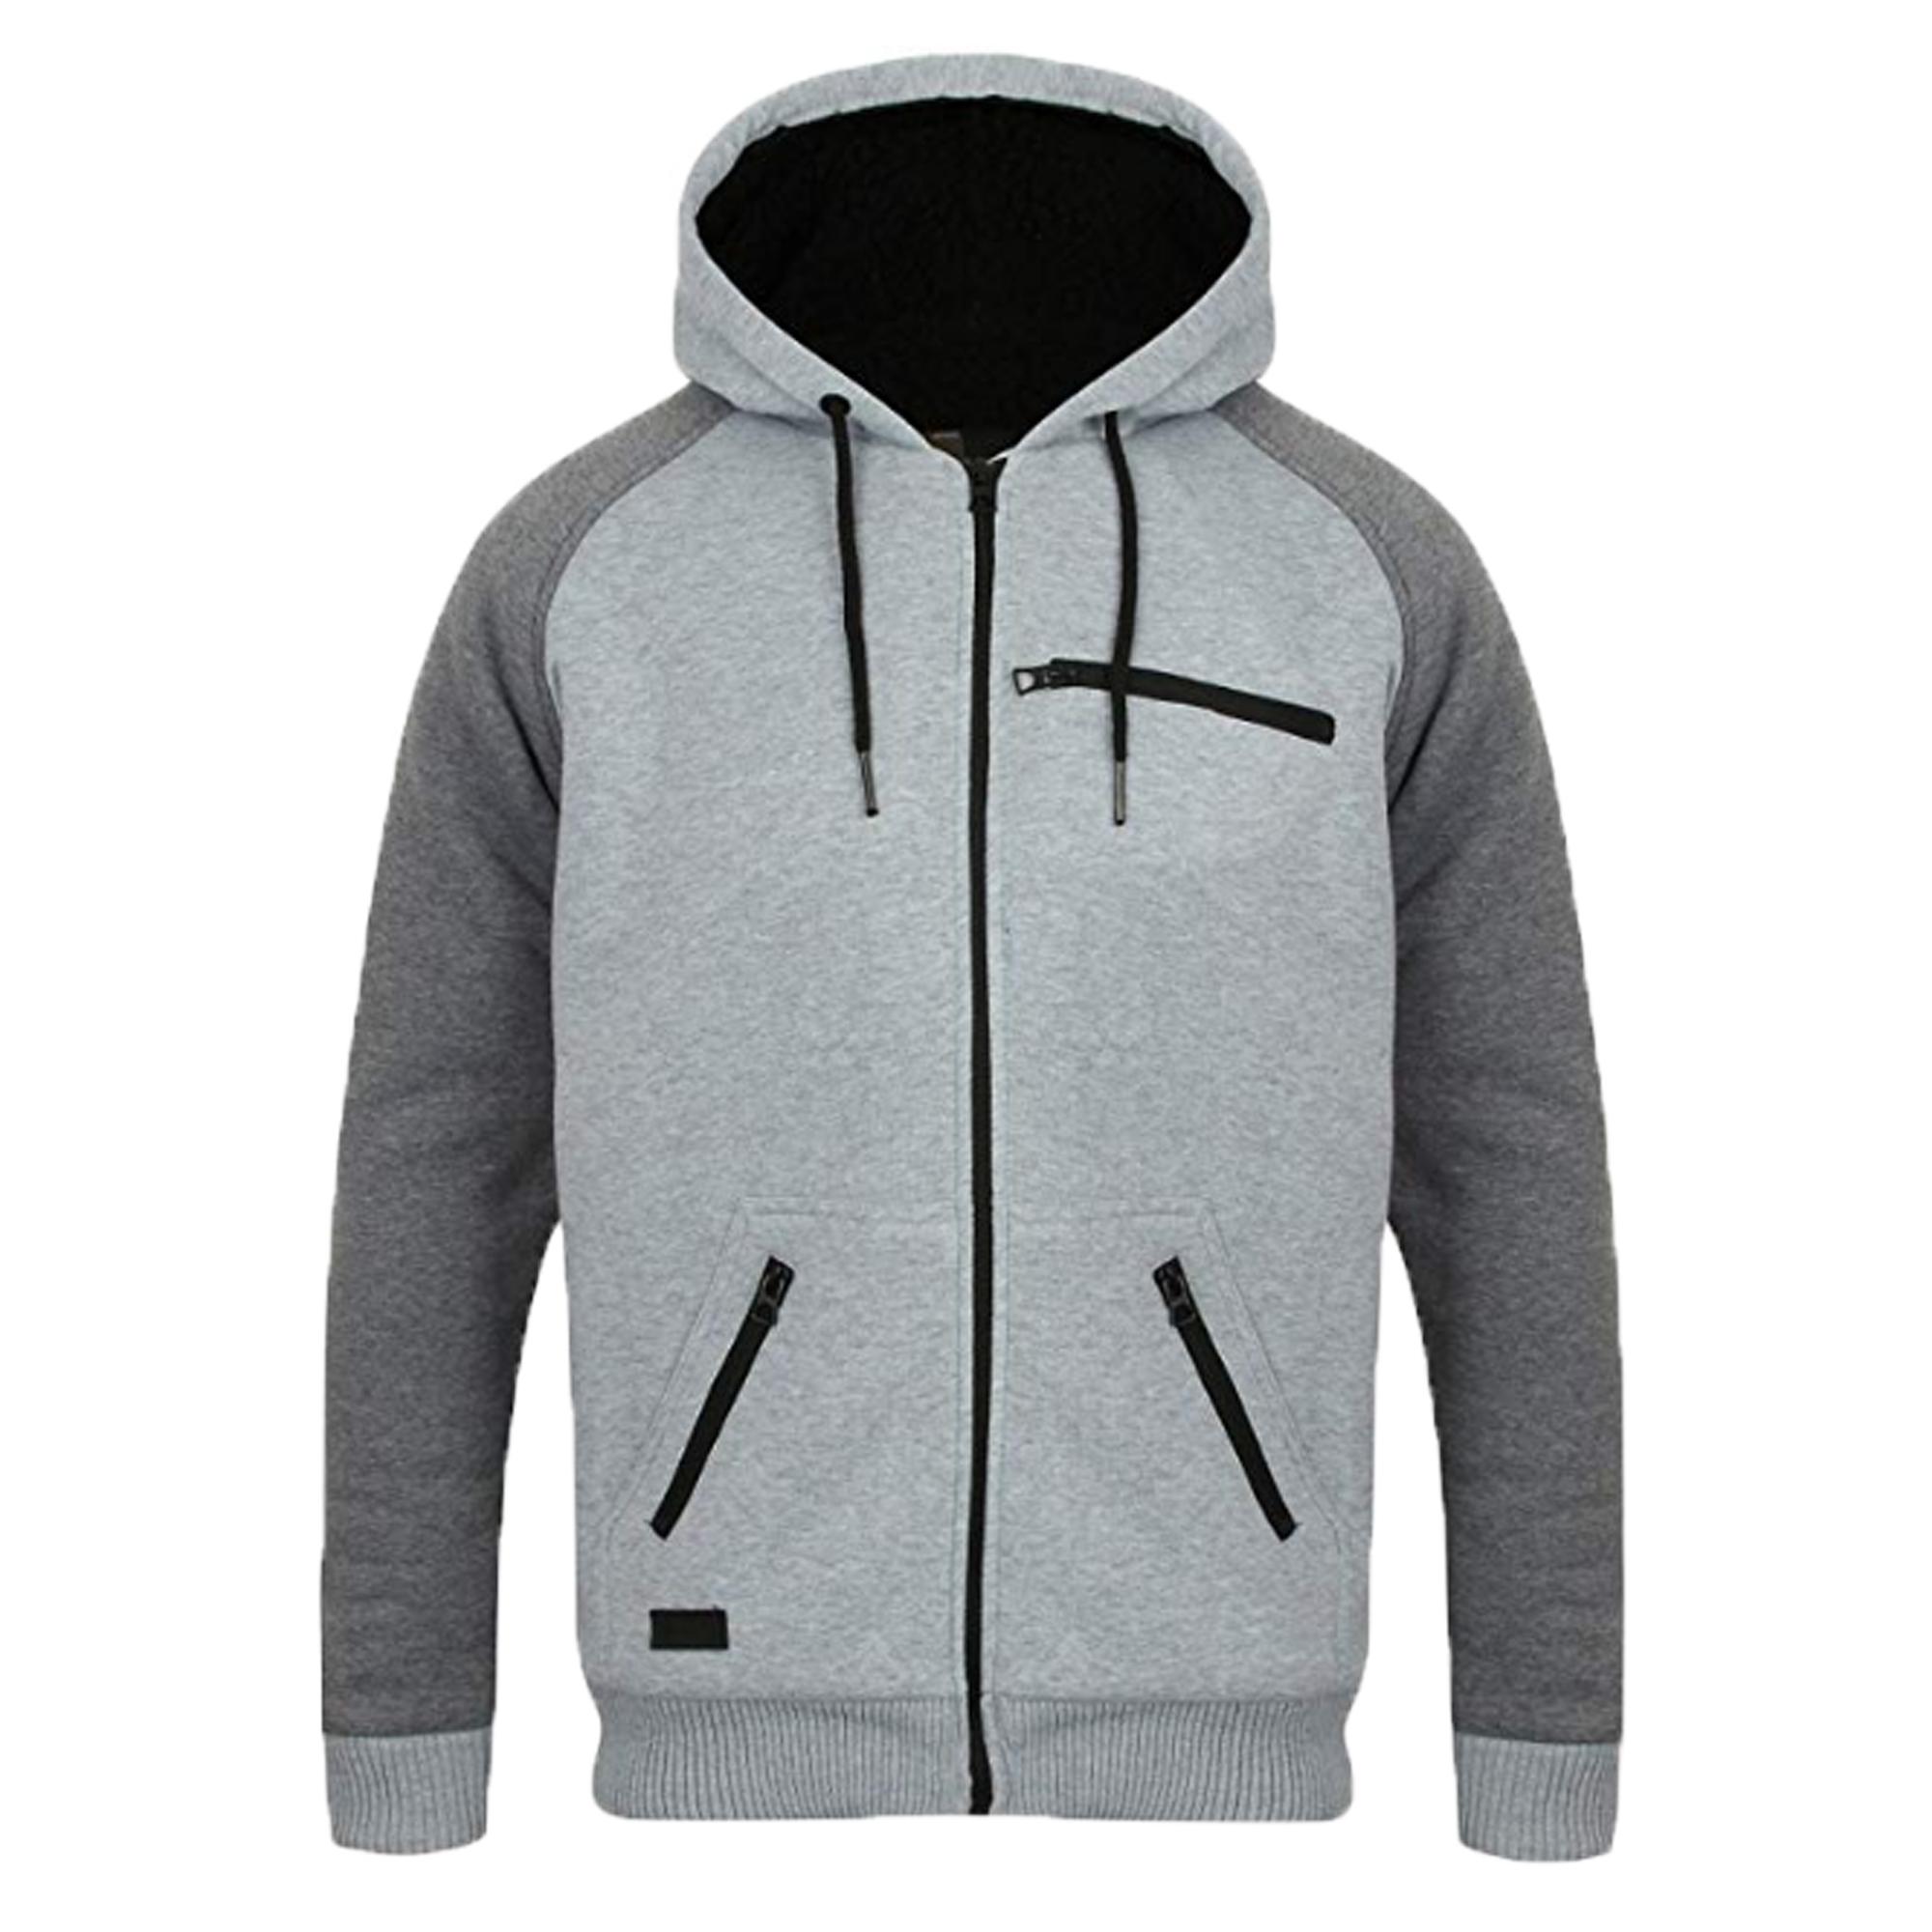 Mens-Jacket-Dissident-Sweatshirt-Hooded-Top-Sherpa-Fleece-Lined-Heavy-BOLO-New thumbnail 18